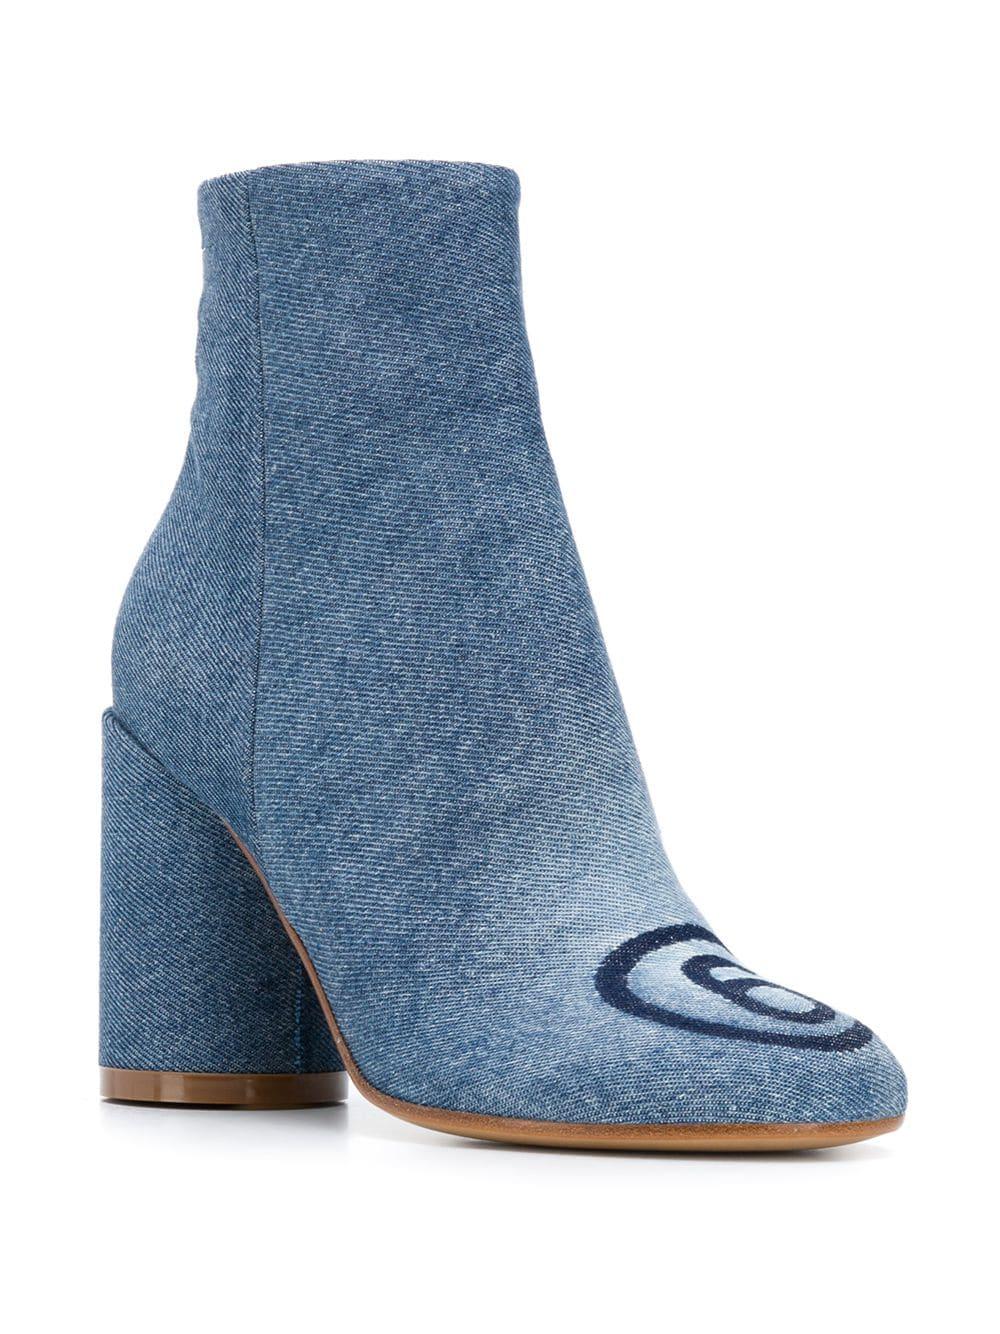 Picture of Mm6 Maison Margiela   Boots